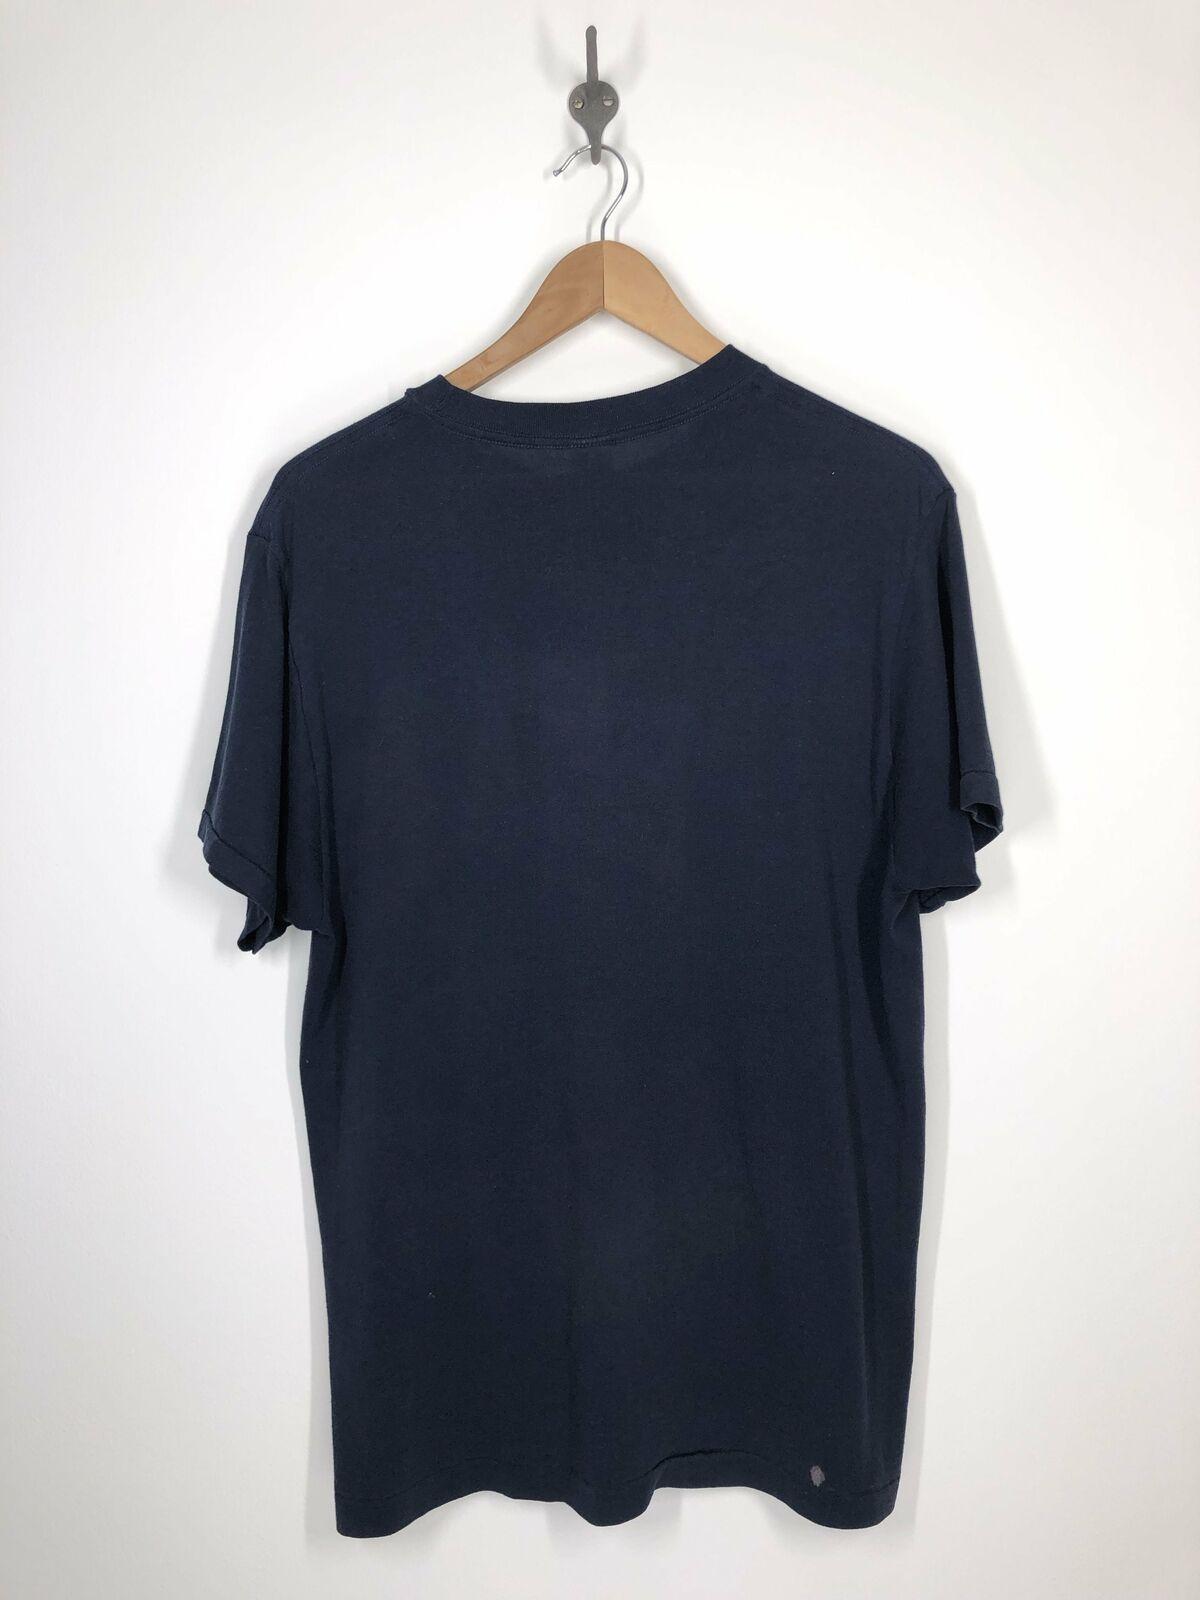 NFL - Chicago Bears Football - 1980s Champion Single Stitch Shirt - XL vtg